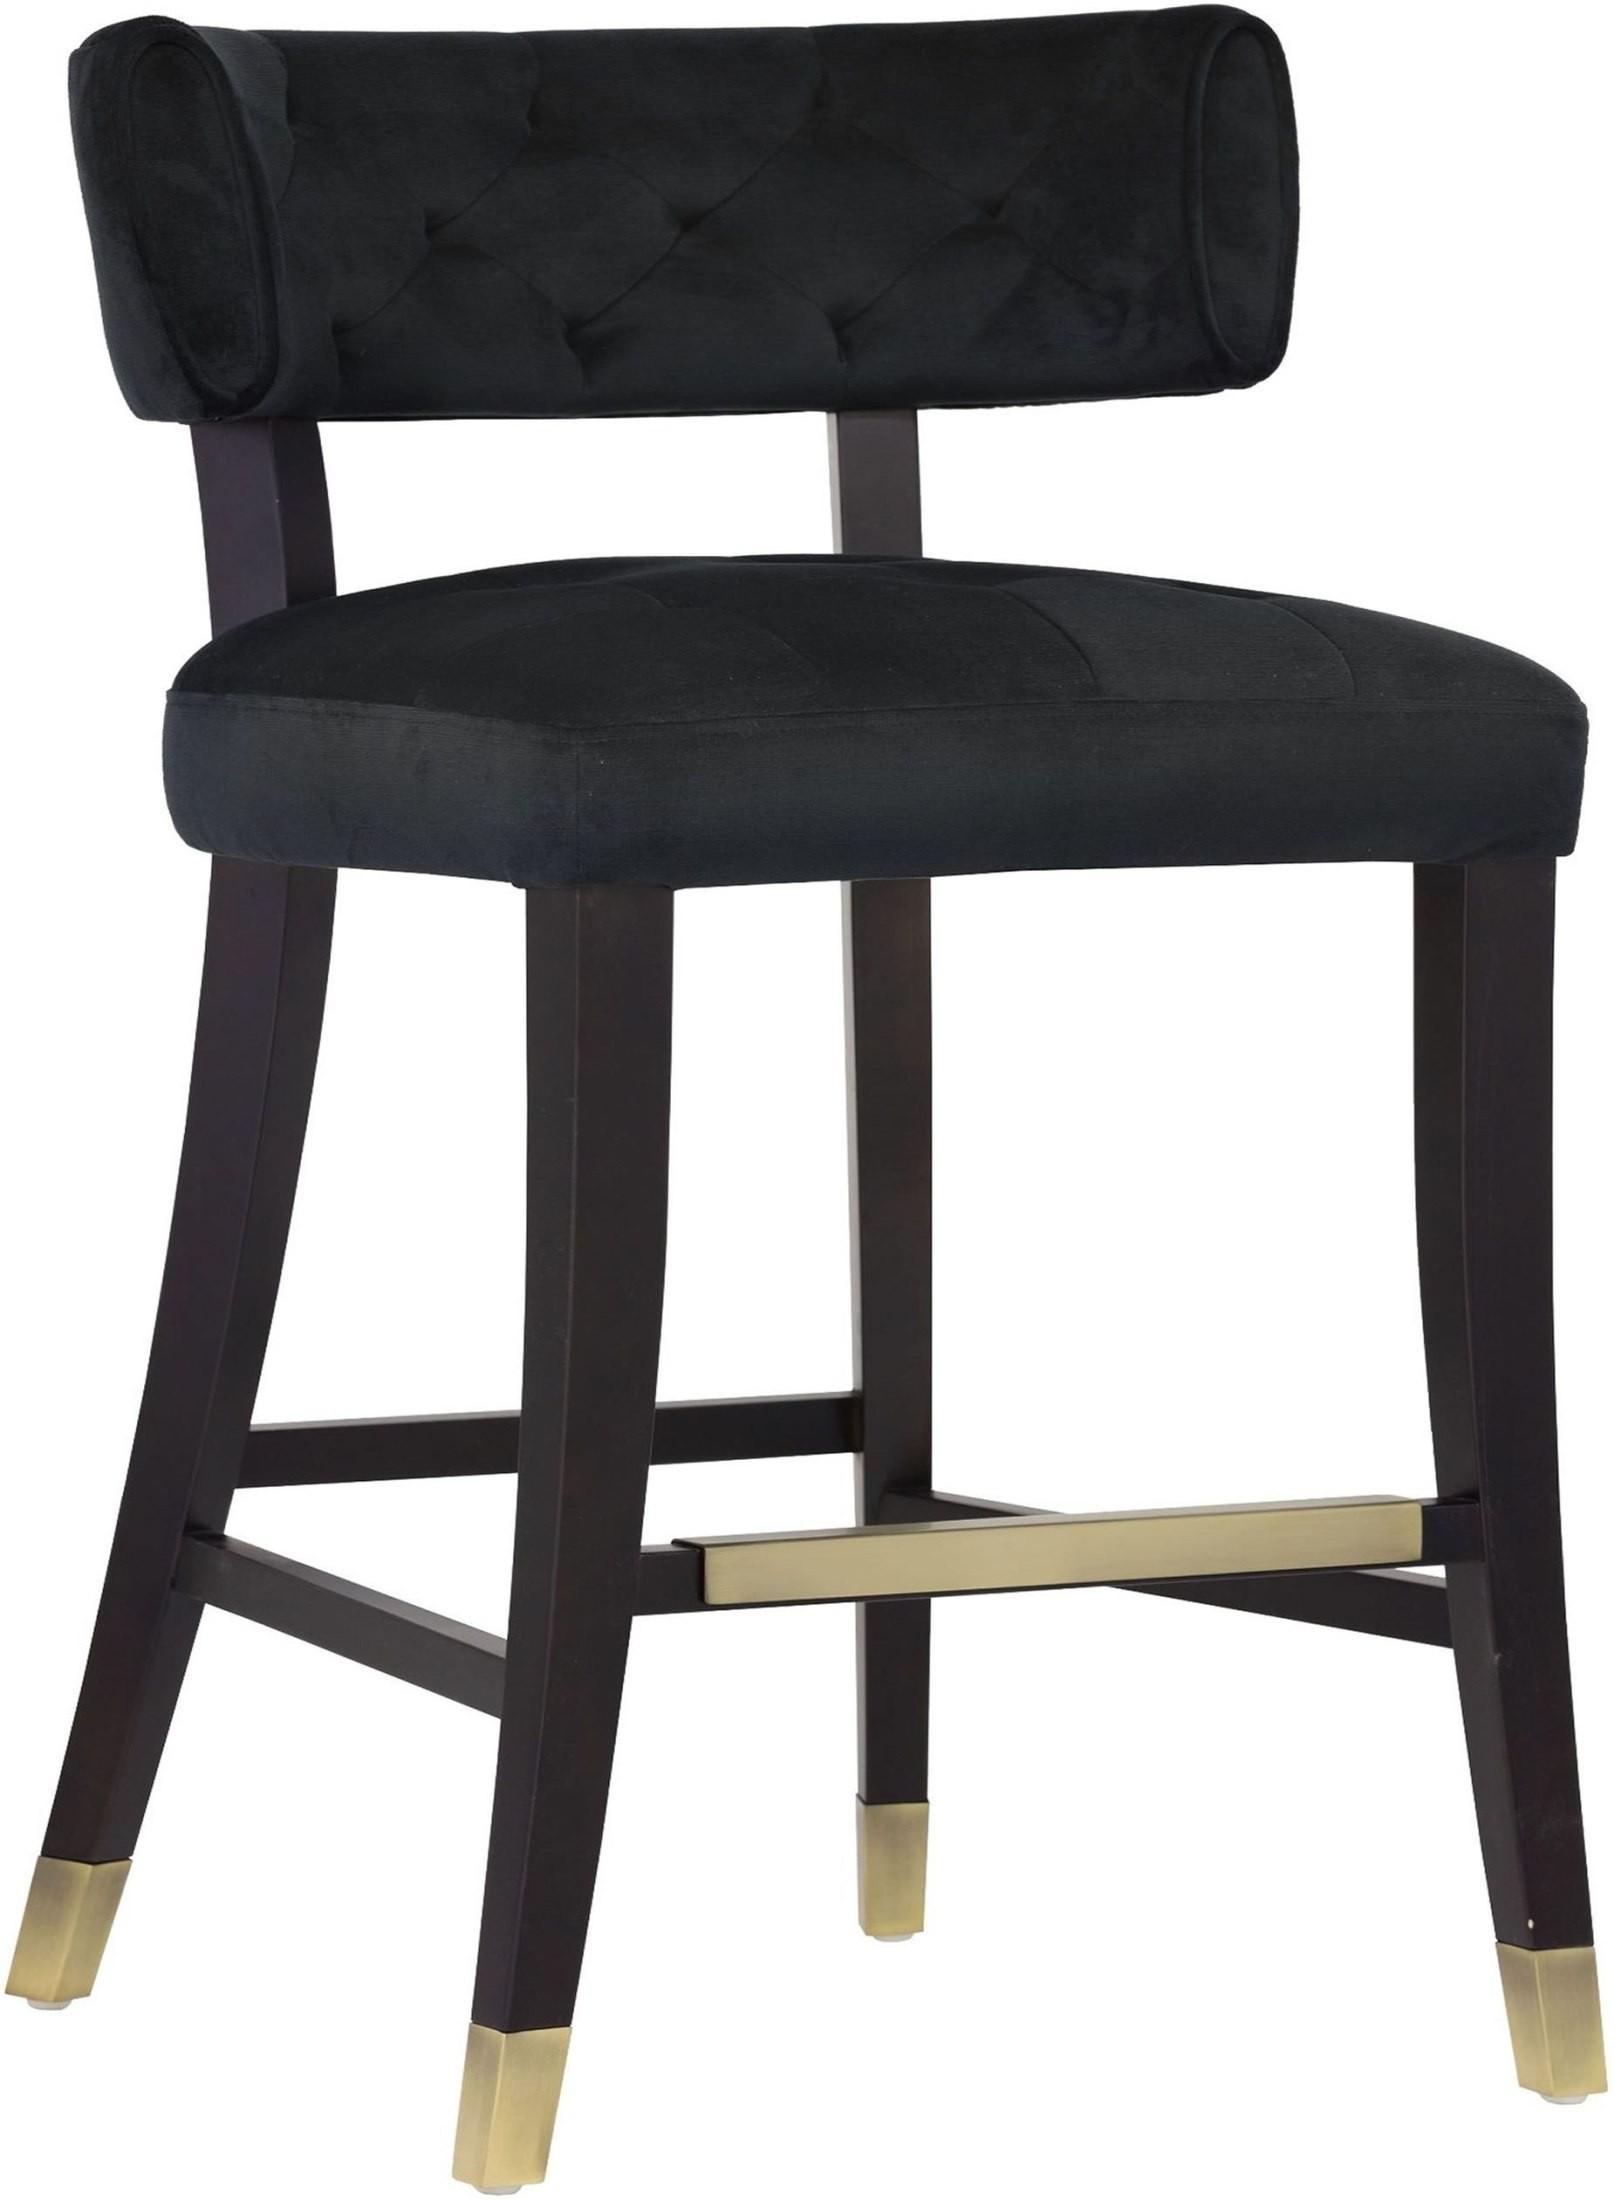 Tatum Piccolo Black Upholstered Counter Stool 102242